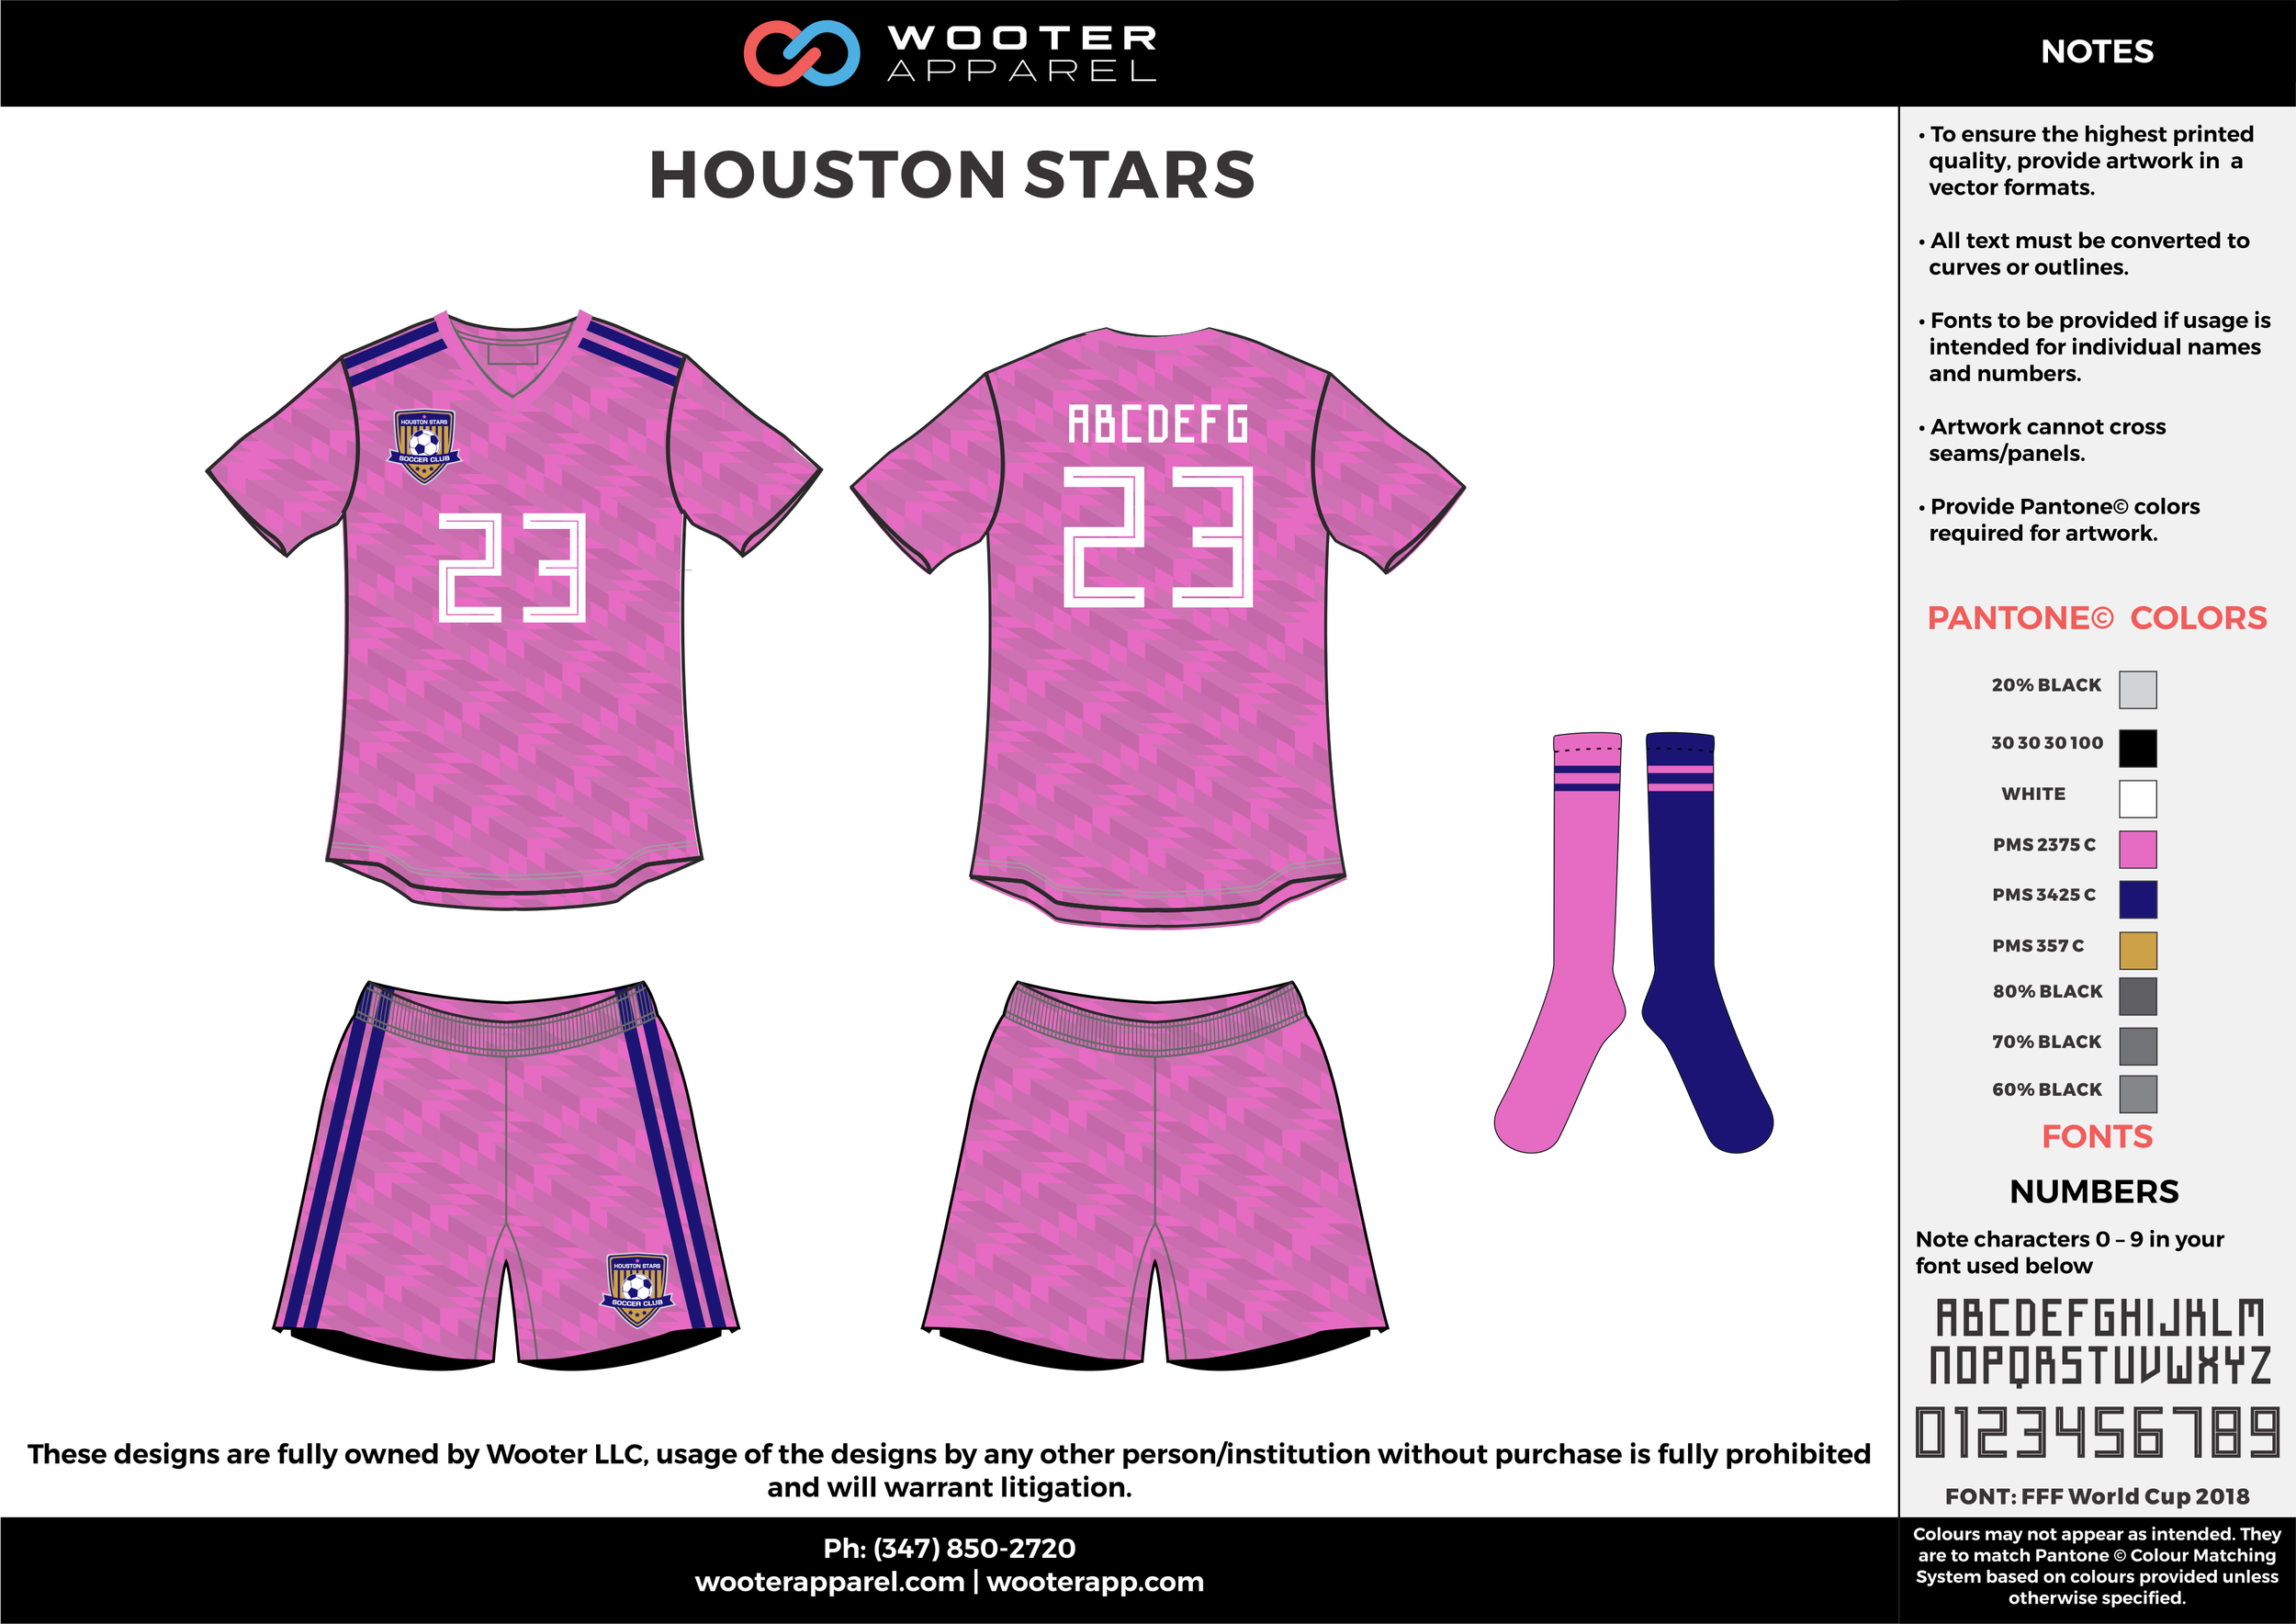 HOUSTON STARS pink blue white gray custom sublimated soccer uniform jersey shirt shorts socks